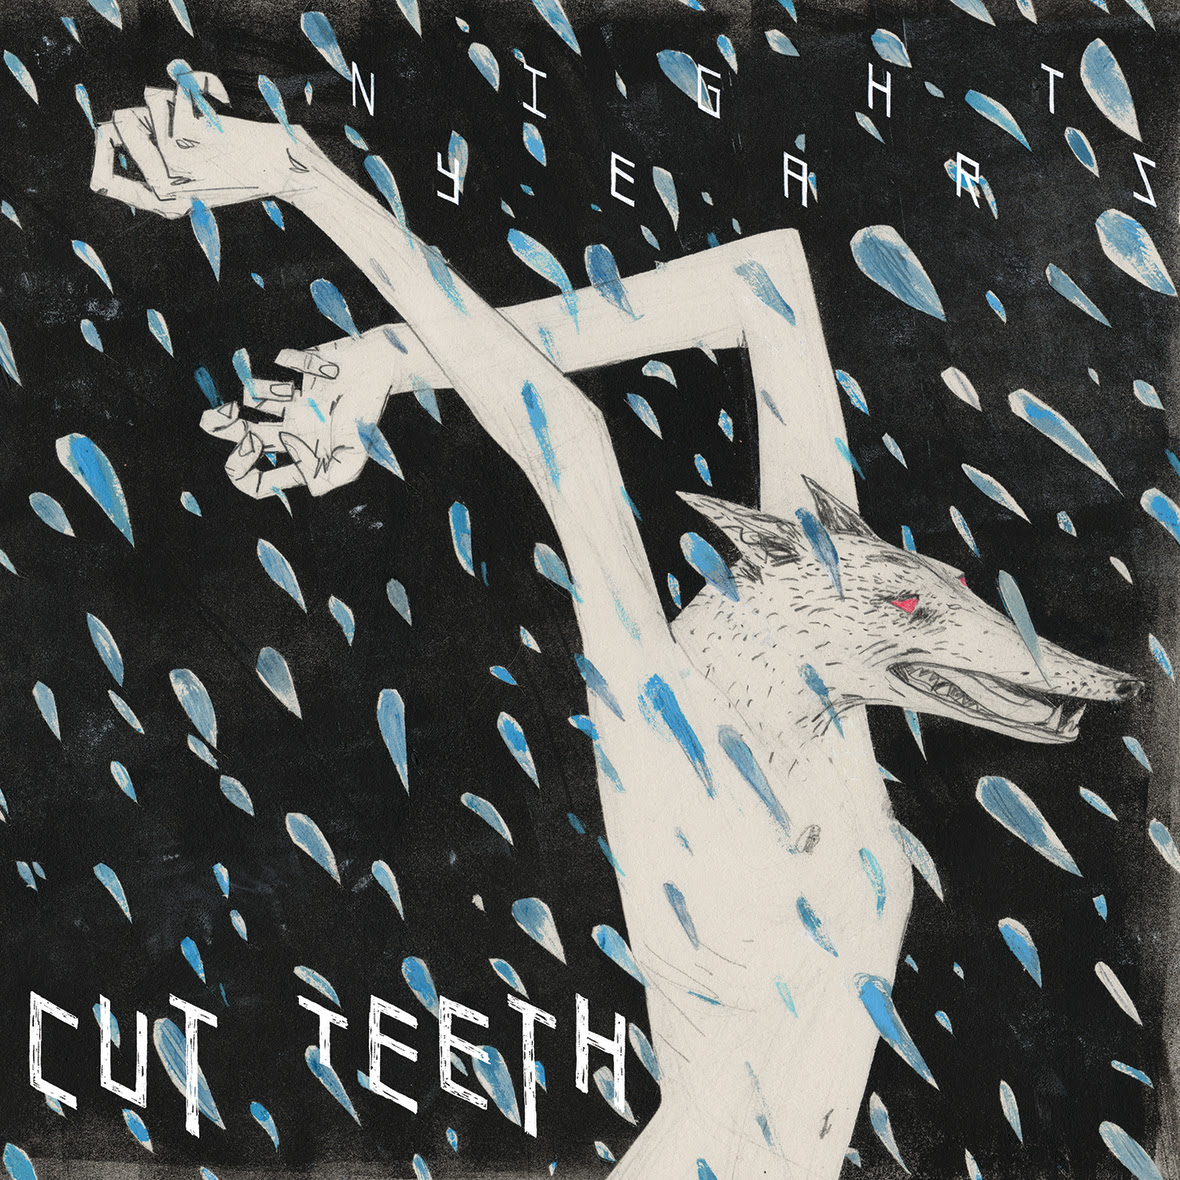 cut teeth night years cover art aug 2014